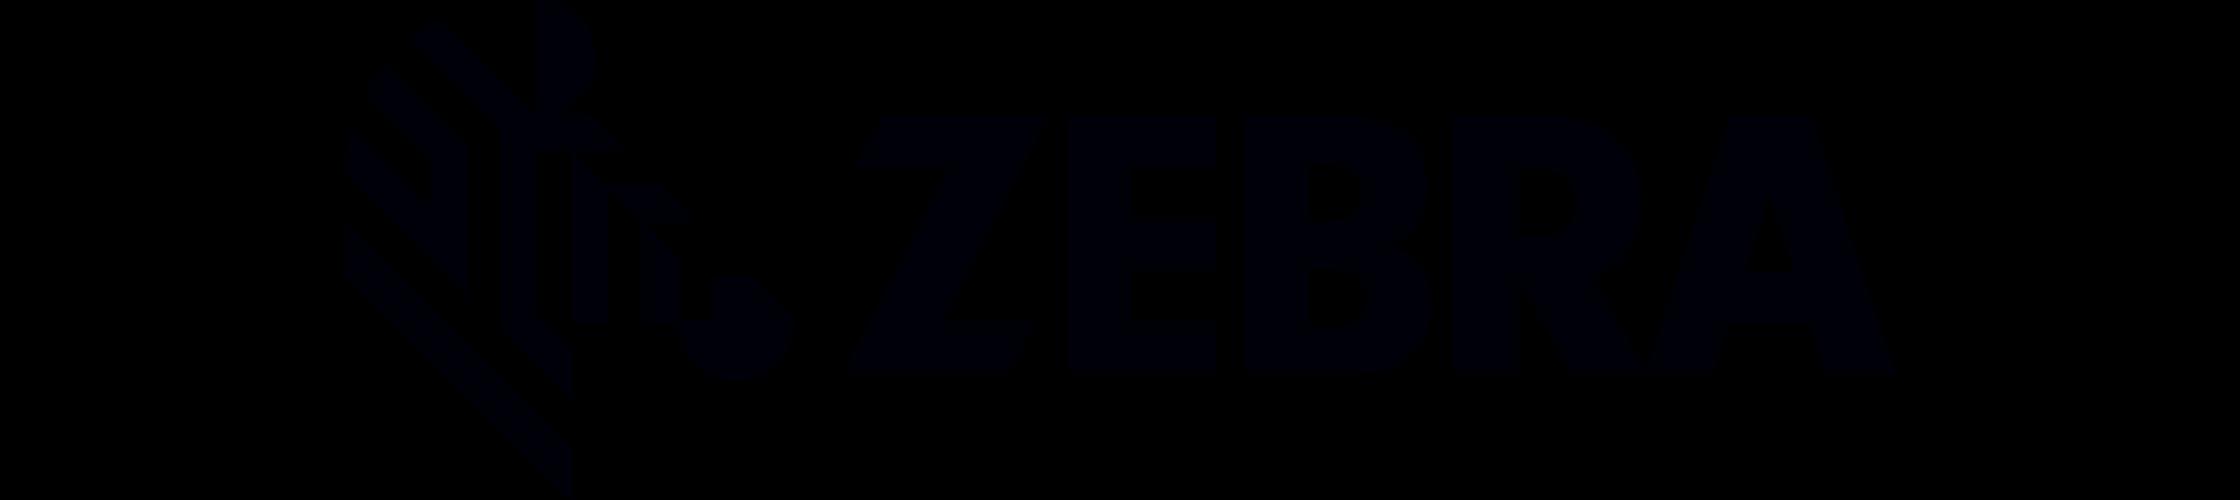 zebra_o